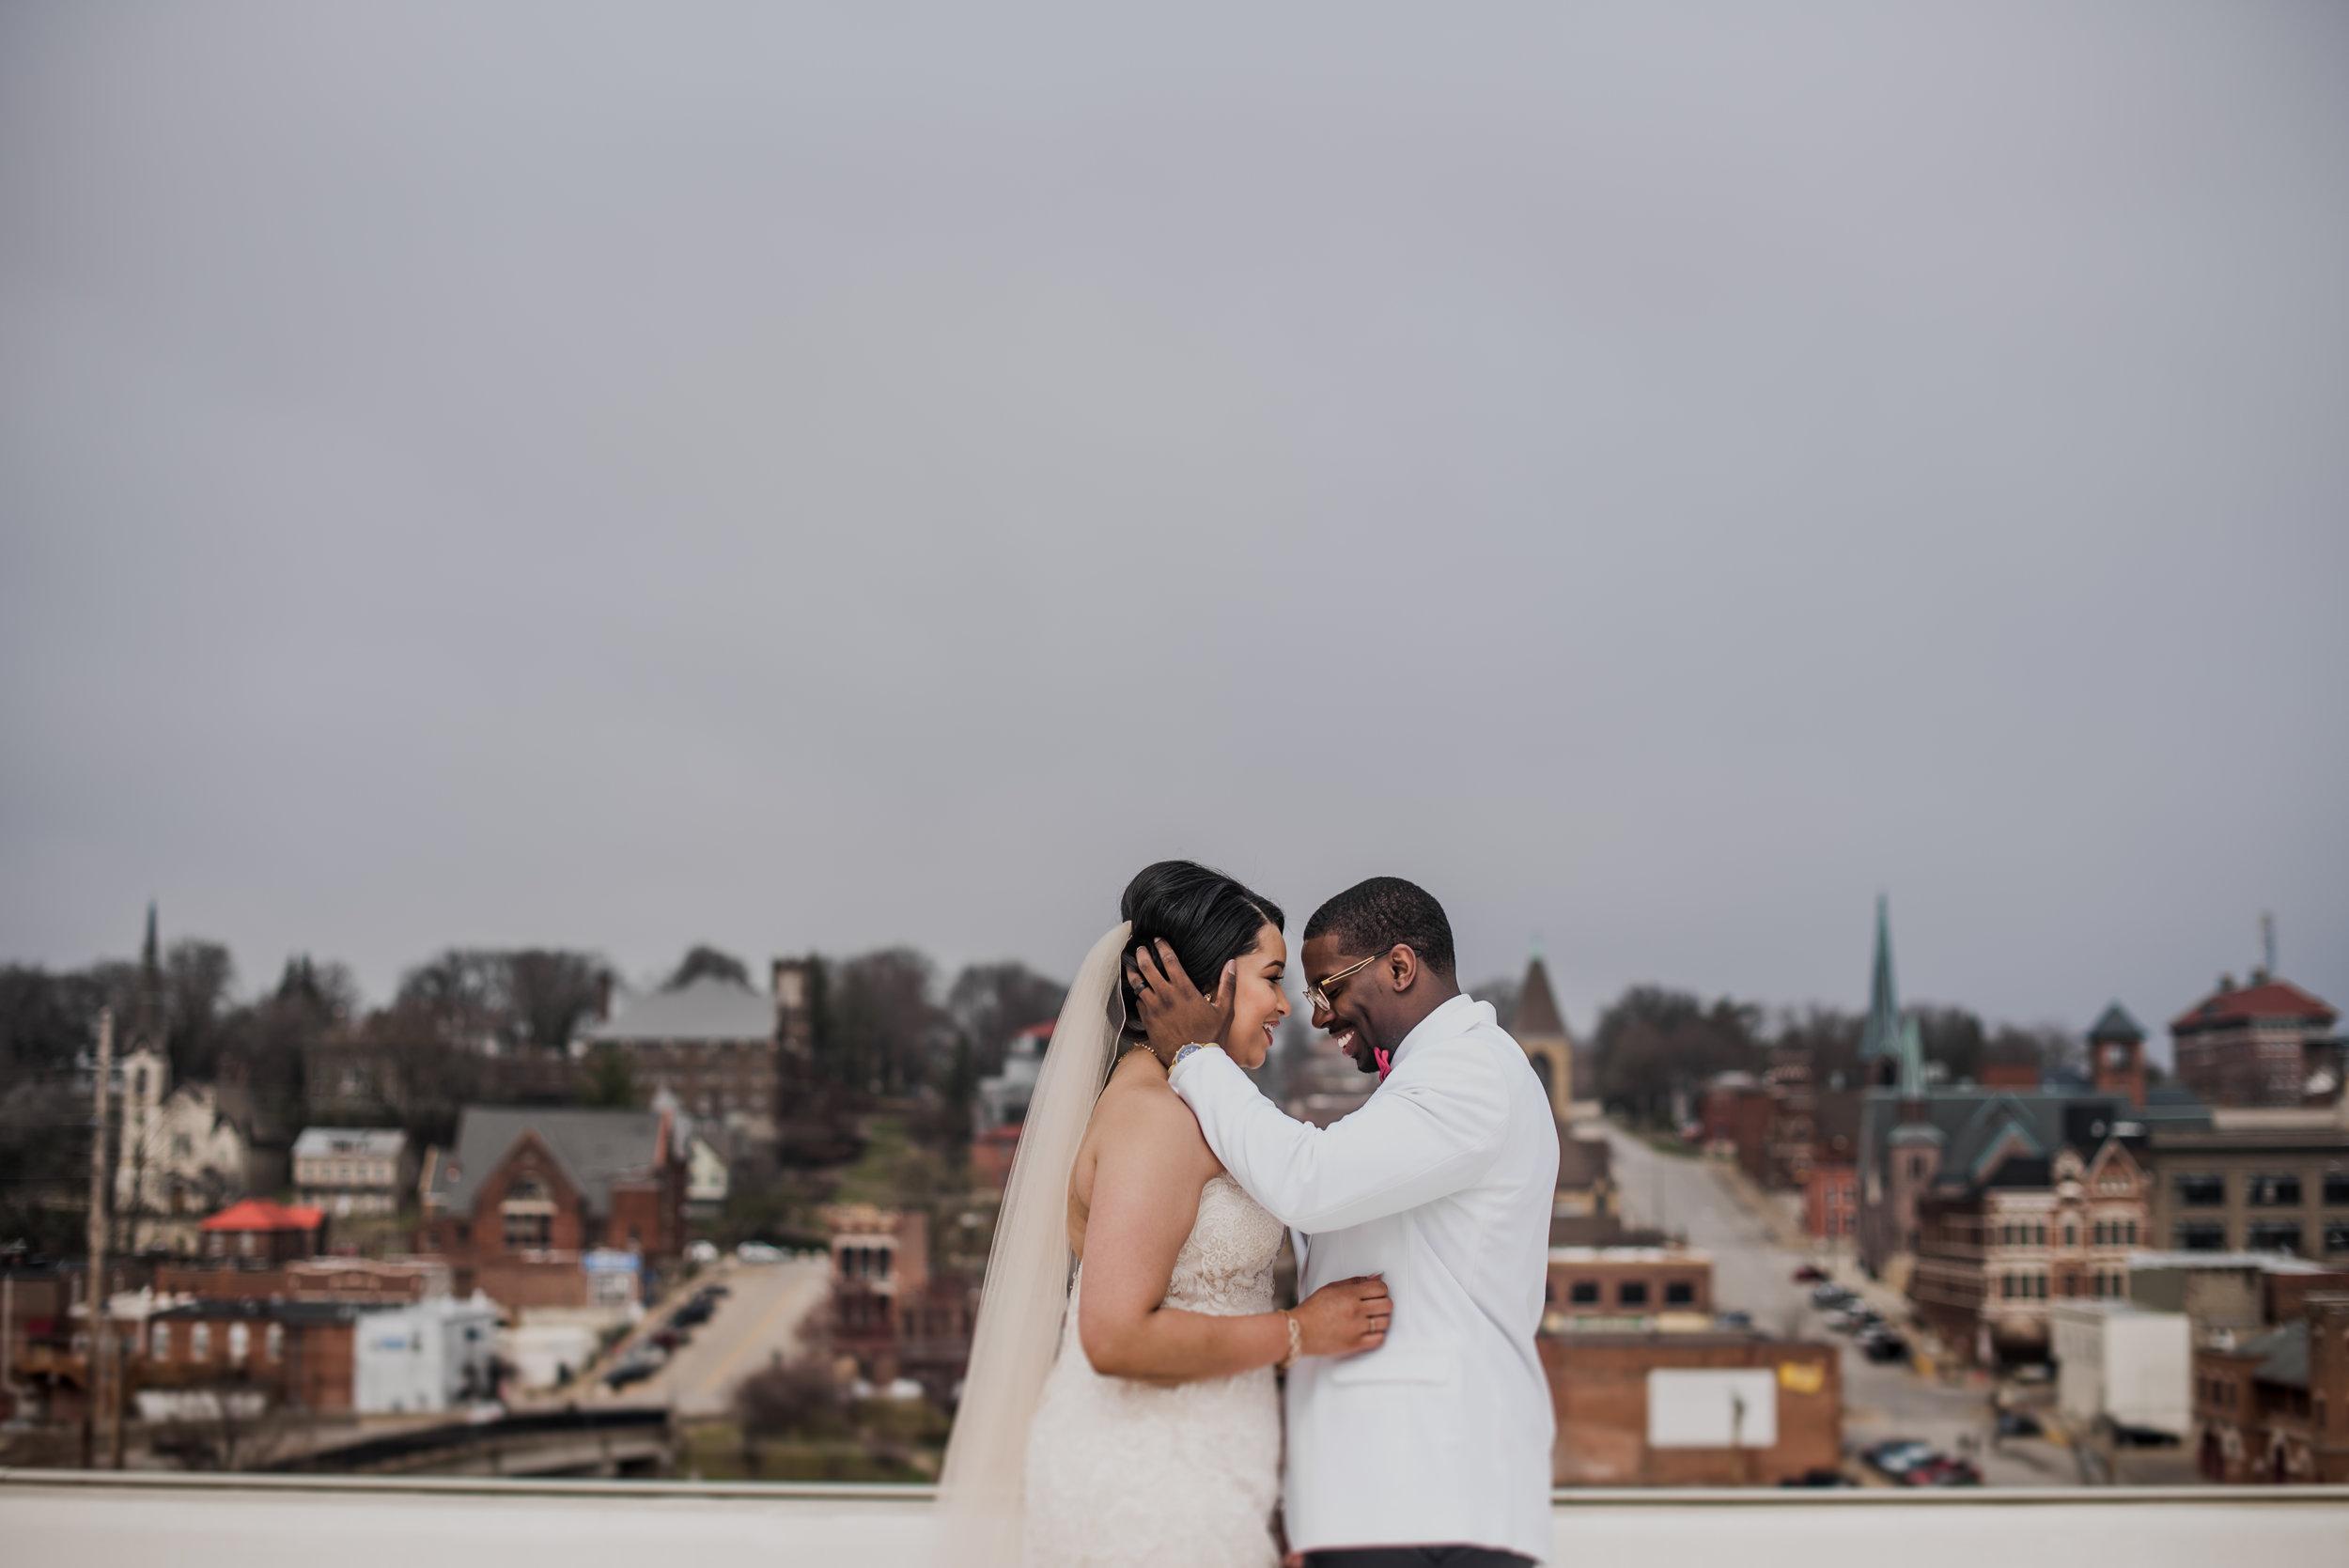 Burlington Iowa Wedding Midwest Photographer Melissa Cervantes _ Chantelle and Isaiah 291rr.jpg